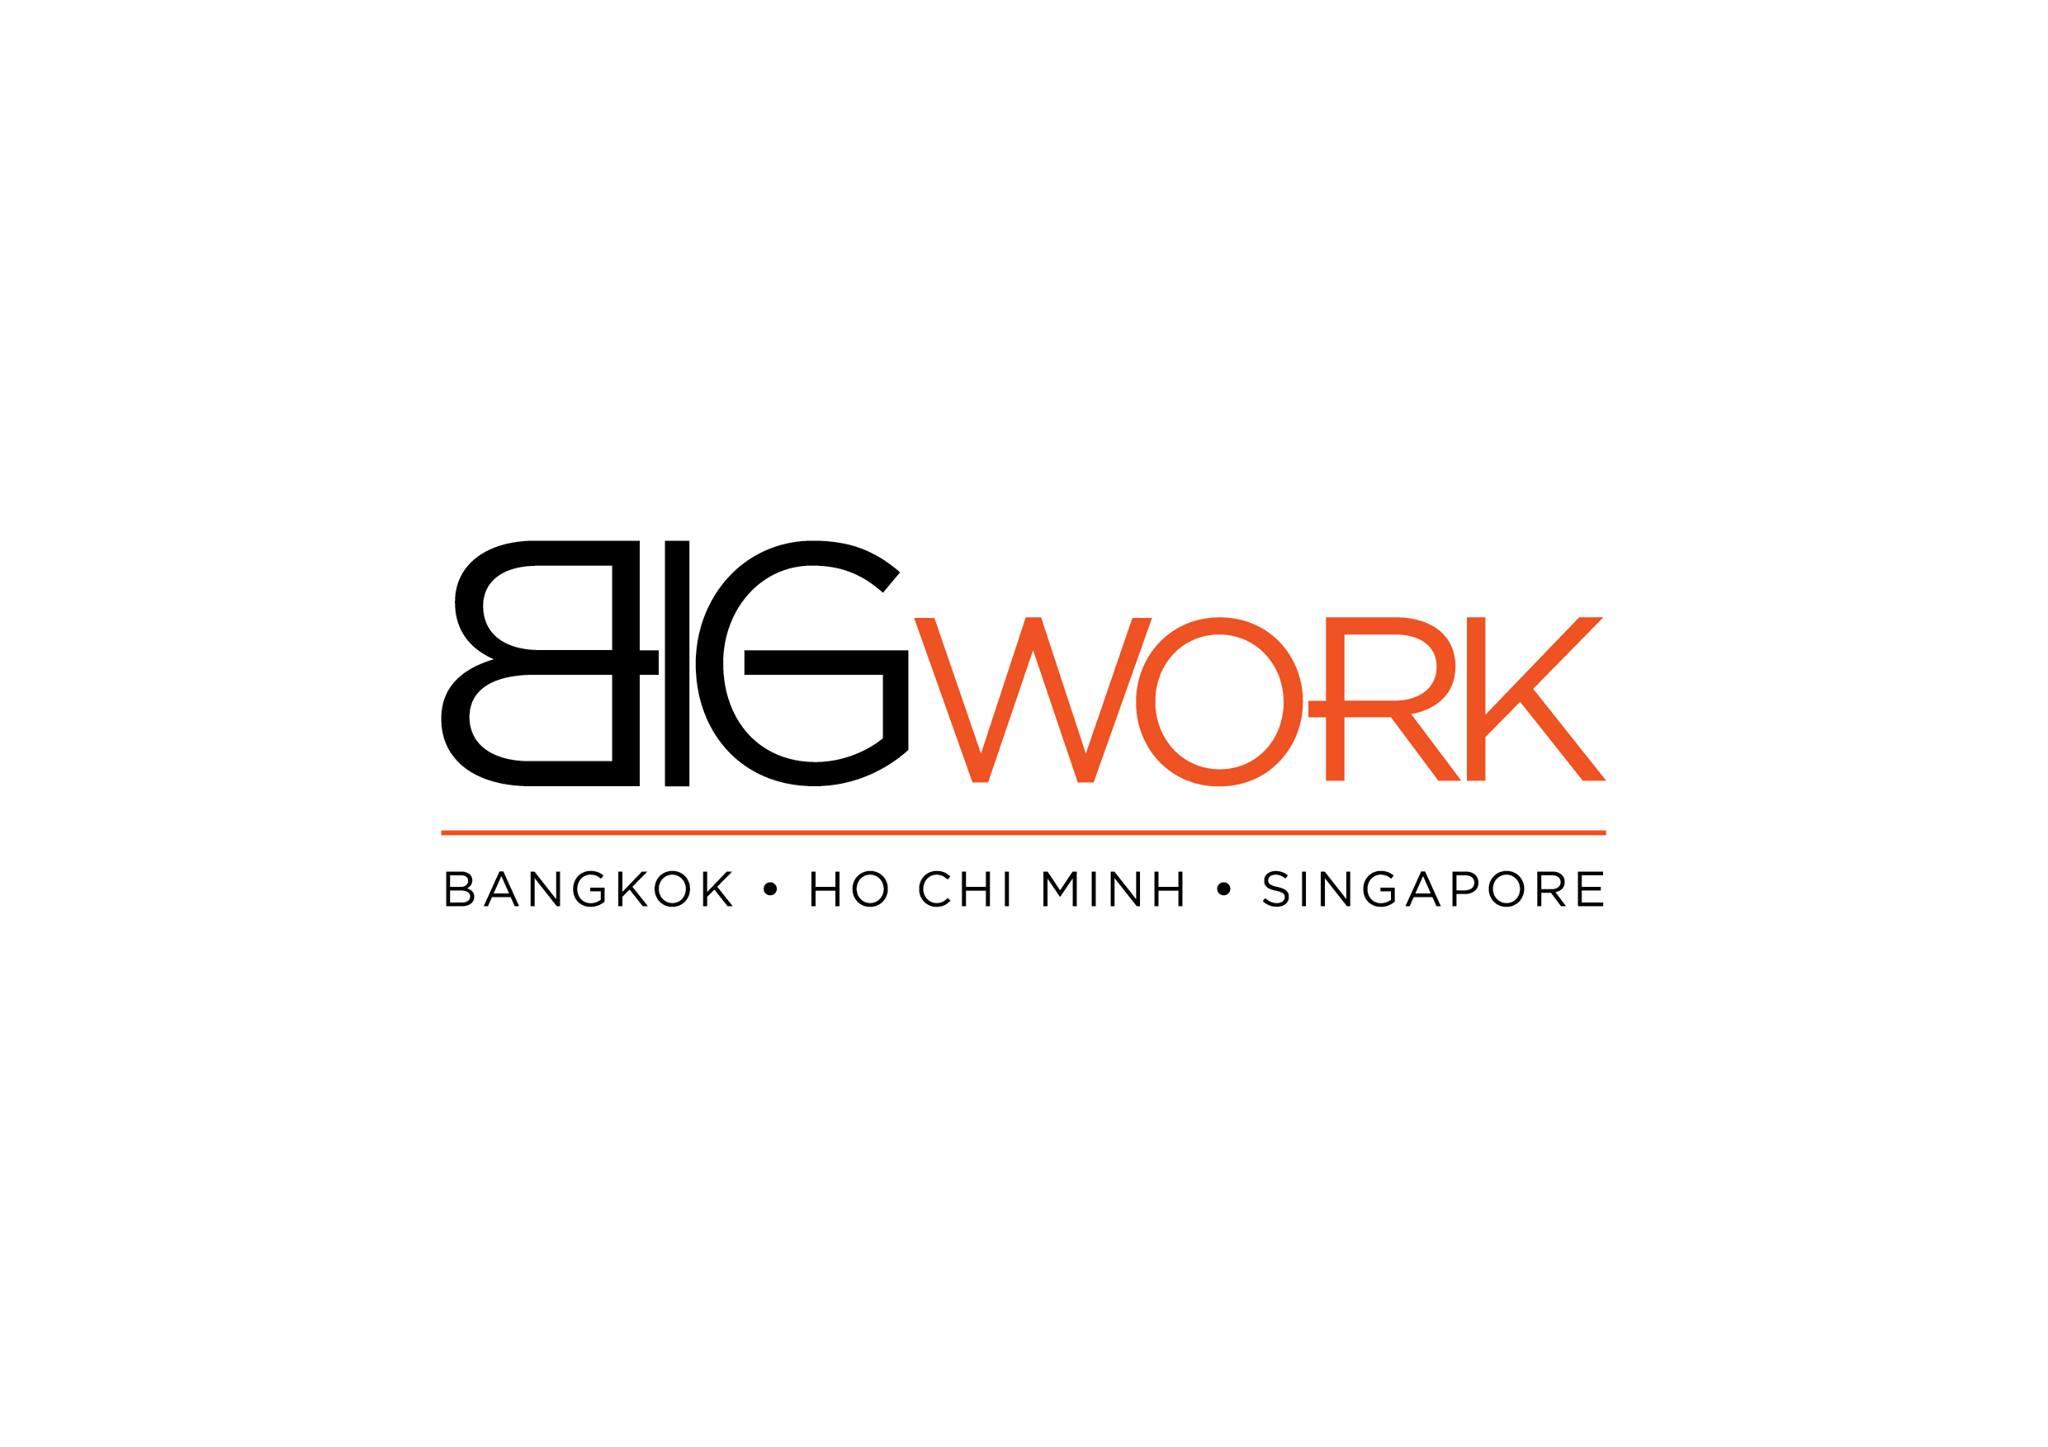 BIGWork, Ho Chi Minh City